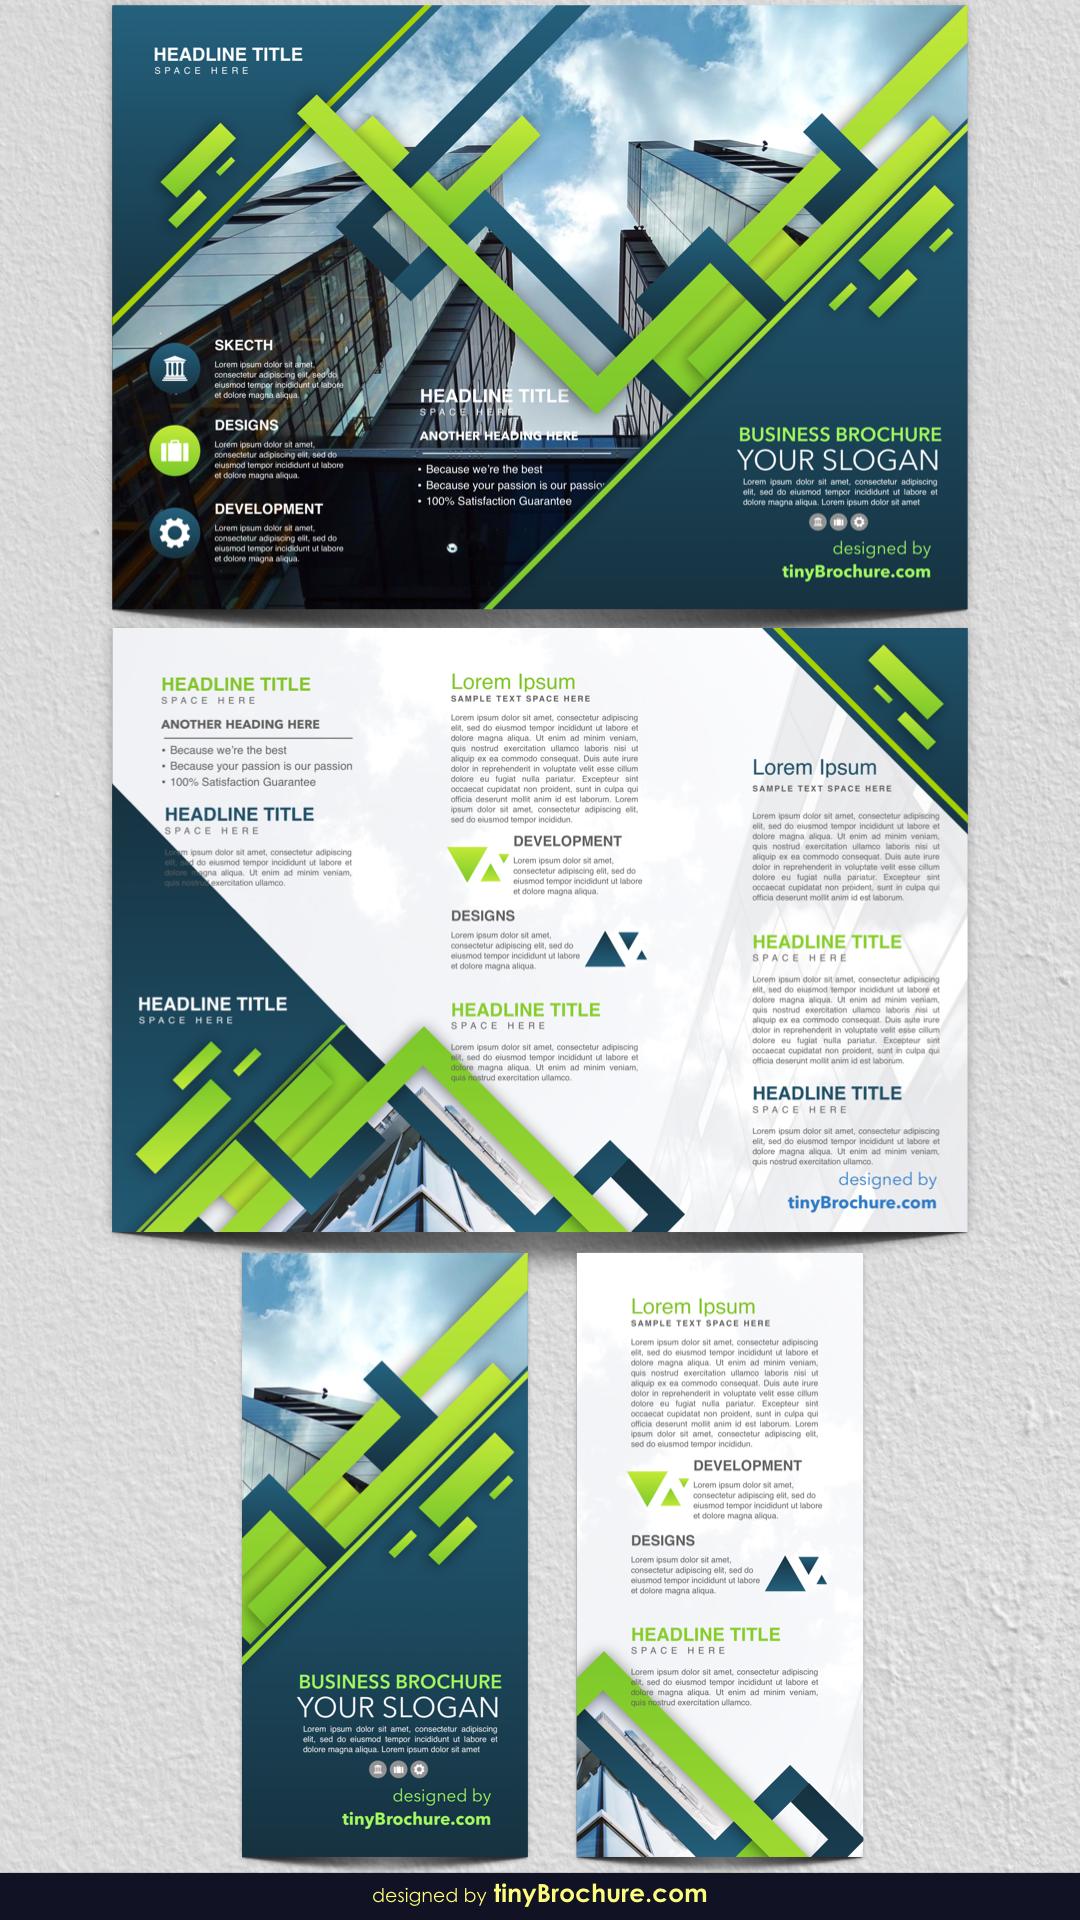 How To Make A Brochure On Google Docs   Brochure design template ...